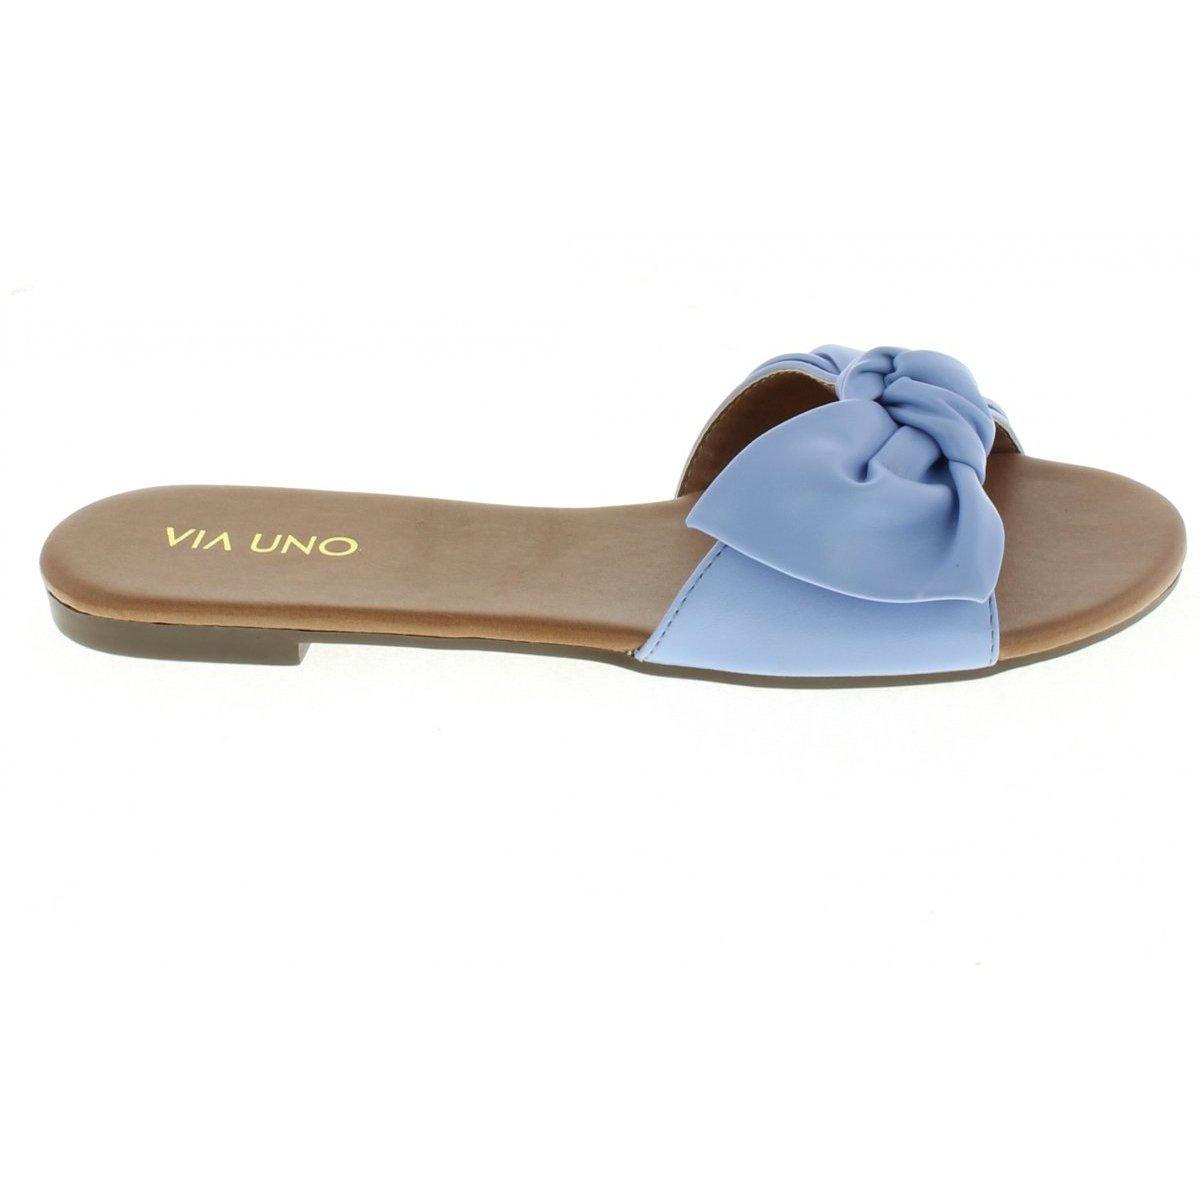 Rasteira Via Uno saavv Slide Feminina - Azul